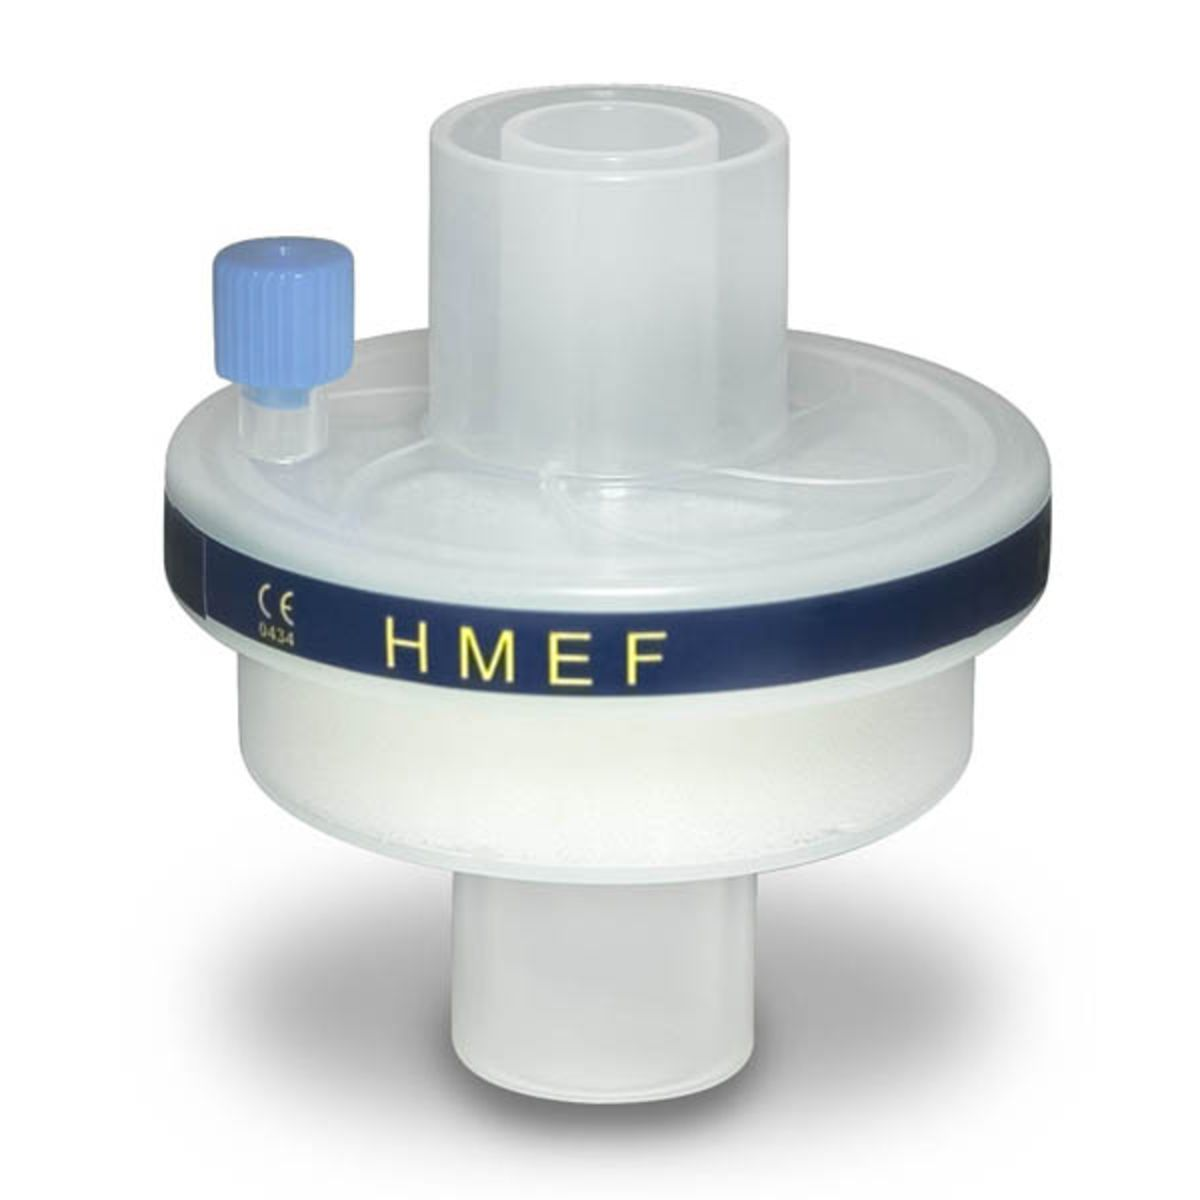 Hmef Breathing Filter